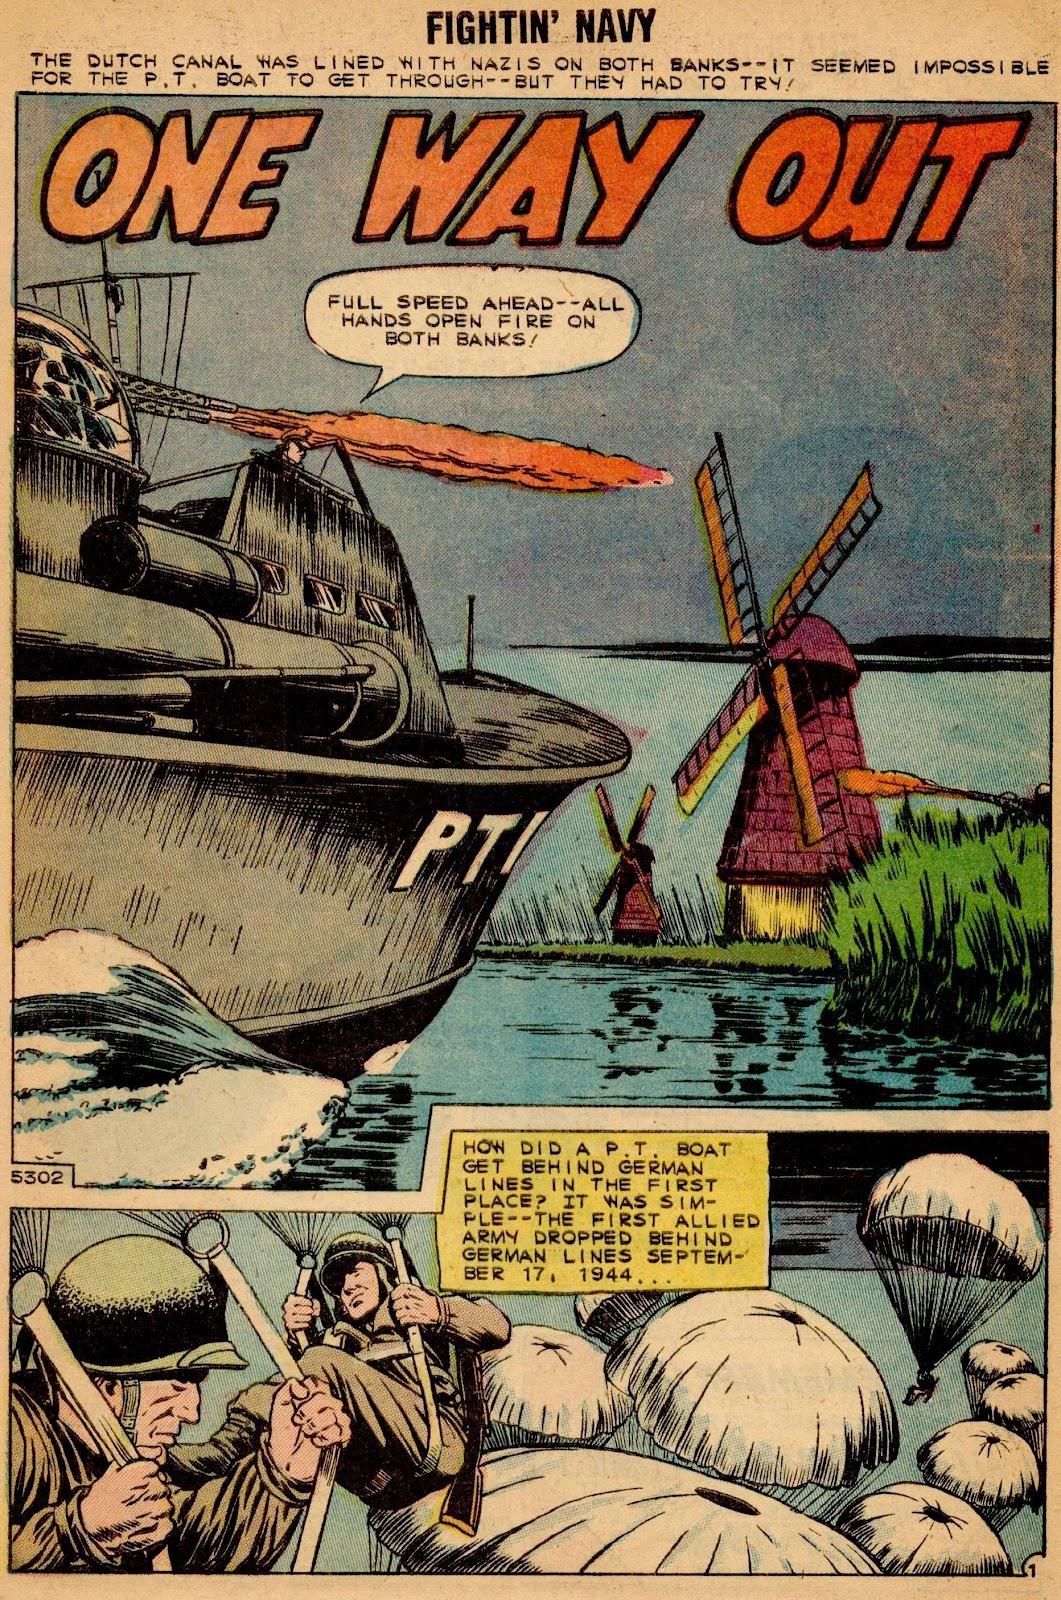 Read online Fightin' Navy comic -  Issue #90 - 28